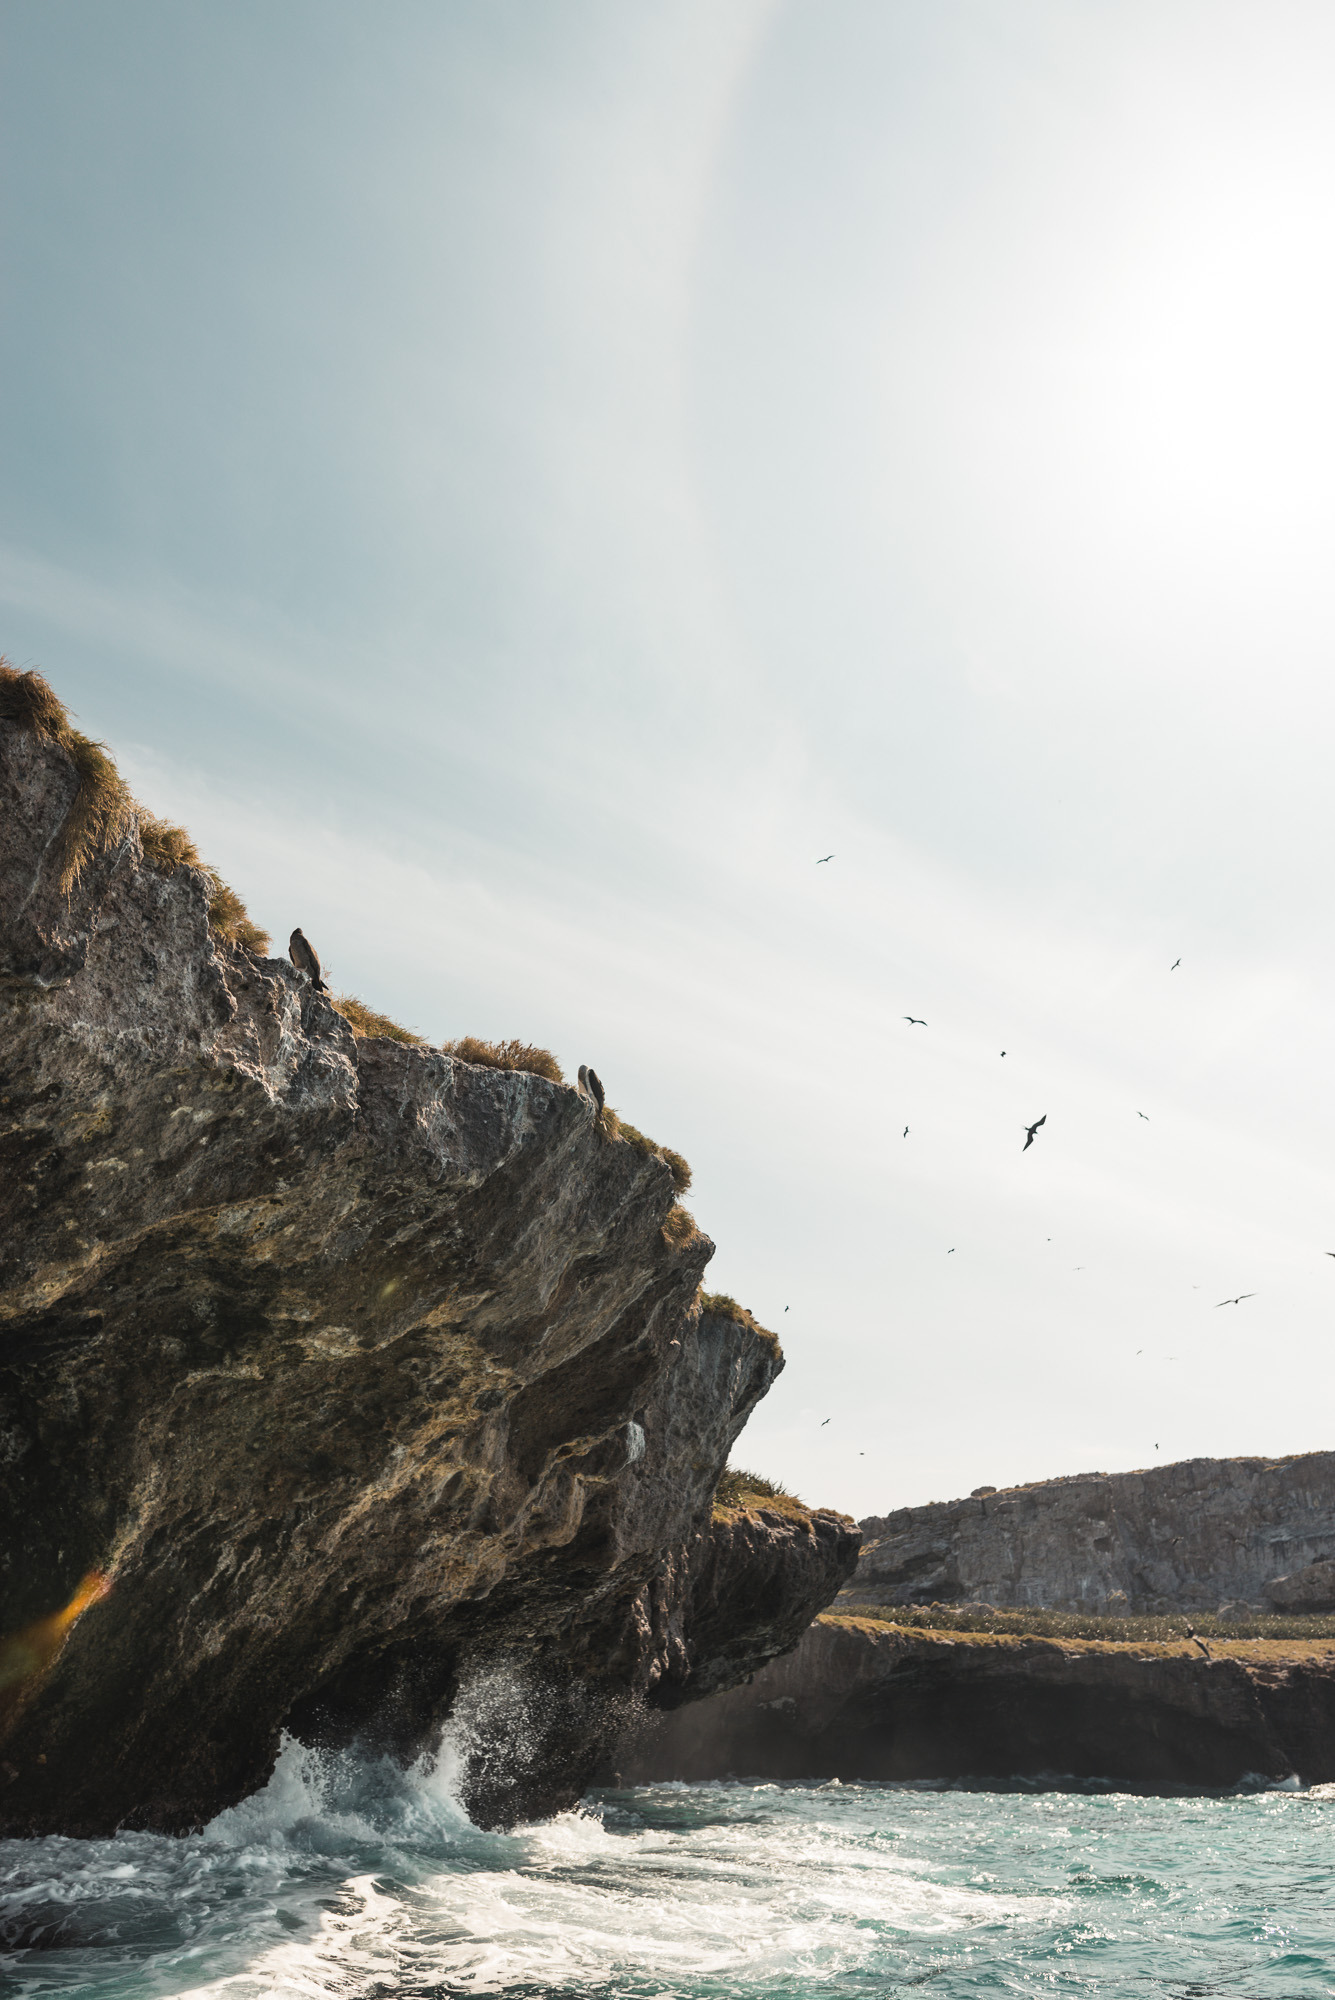 LukeMikler_Landscape_IslasMarietas.jpg